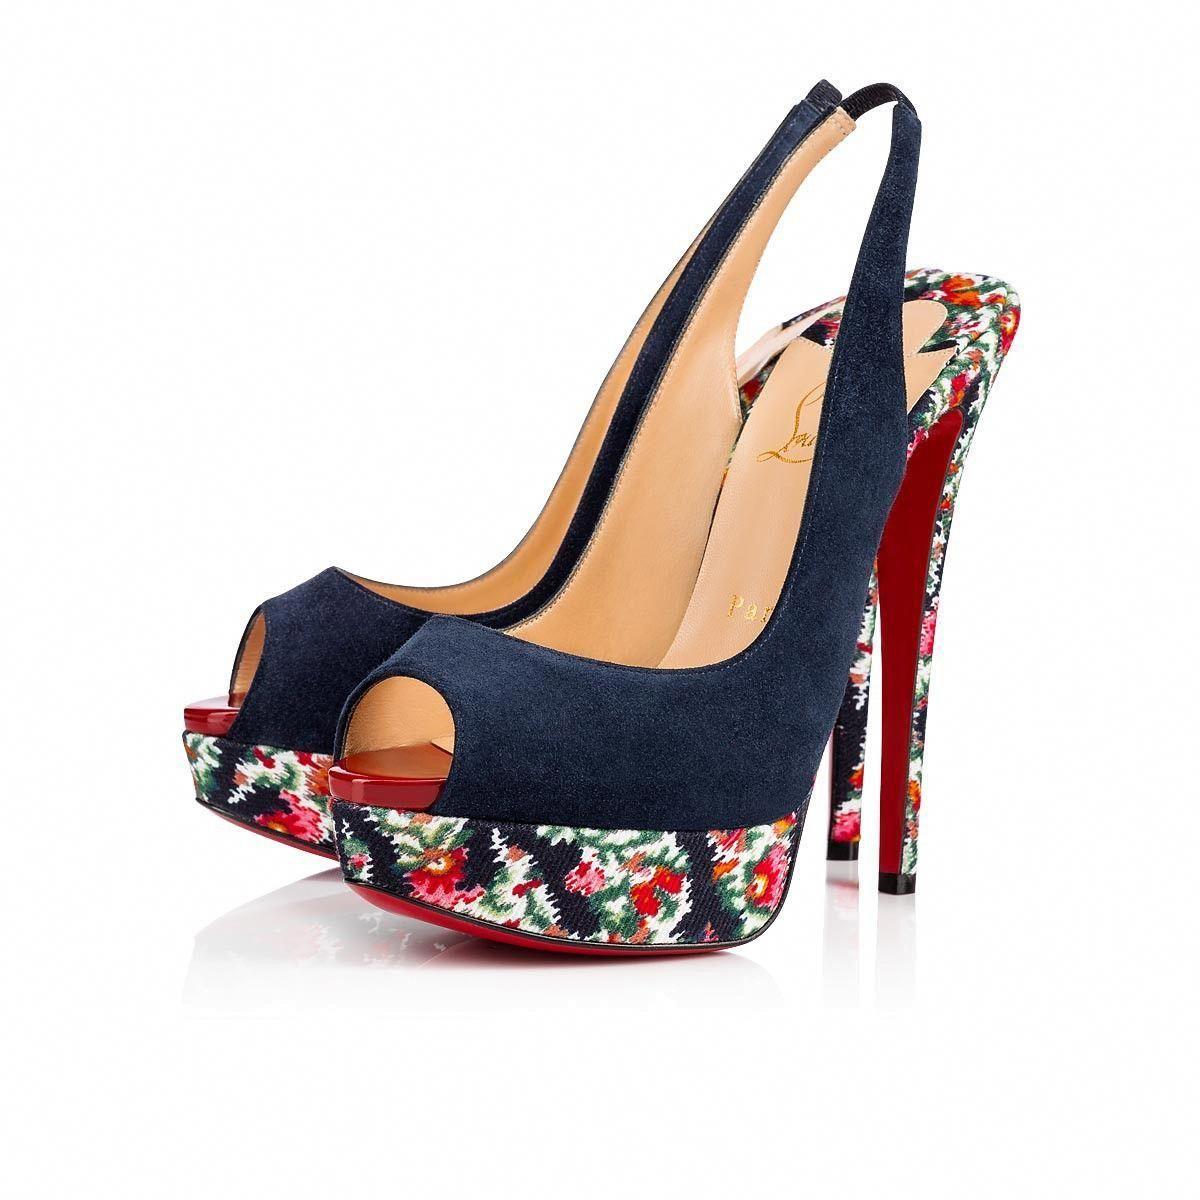 9b5cfa8b53a Shoes - Lady Peep Sling - Christian Louboutin #ChristianLouboutin ...